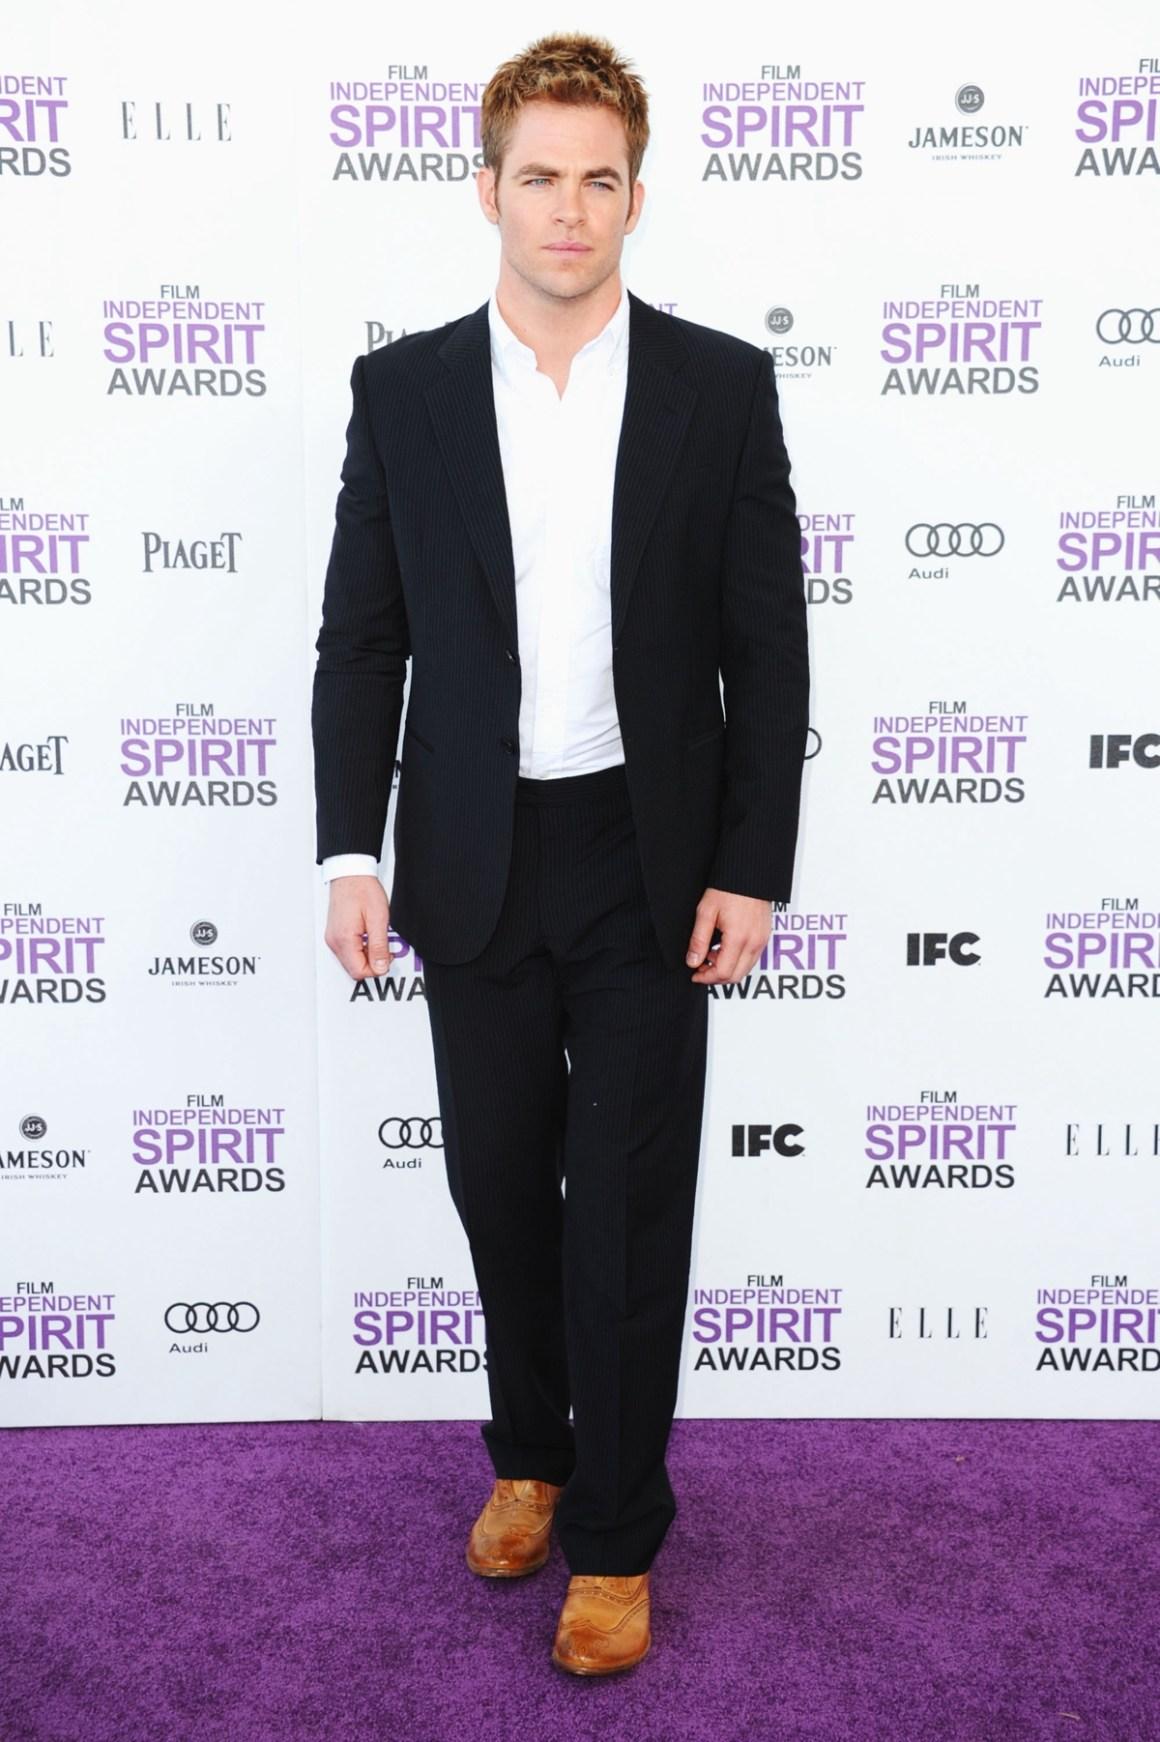 Chris Pine 2012 Film Independent Spirit Awards - Arrivals